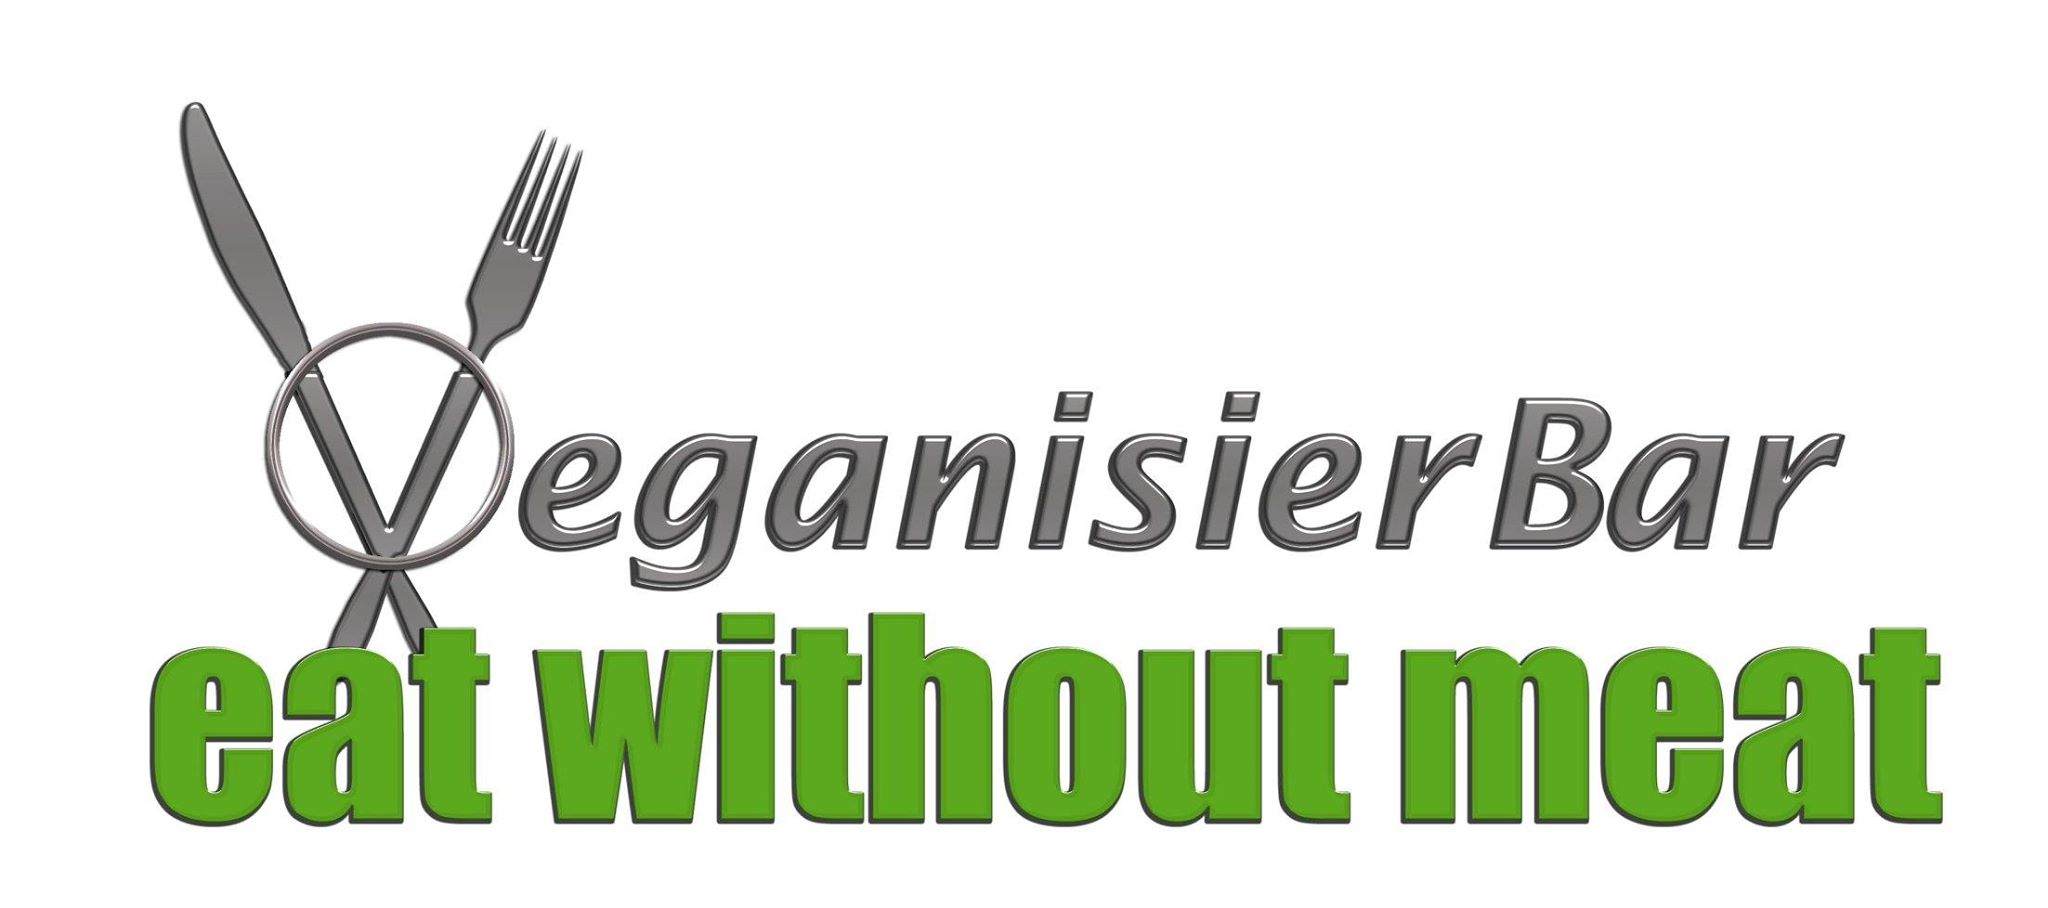 Veganisierbar